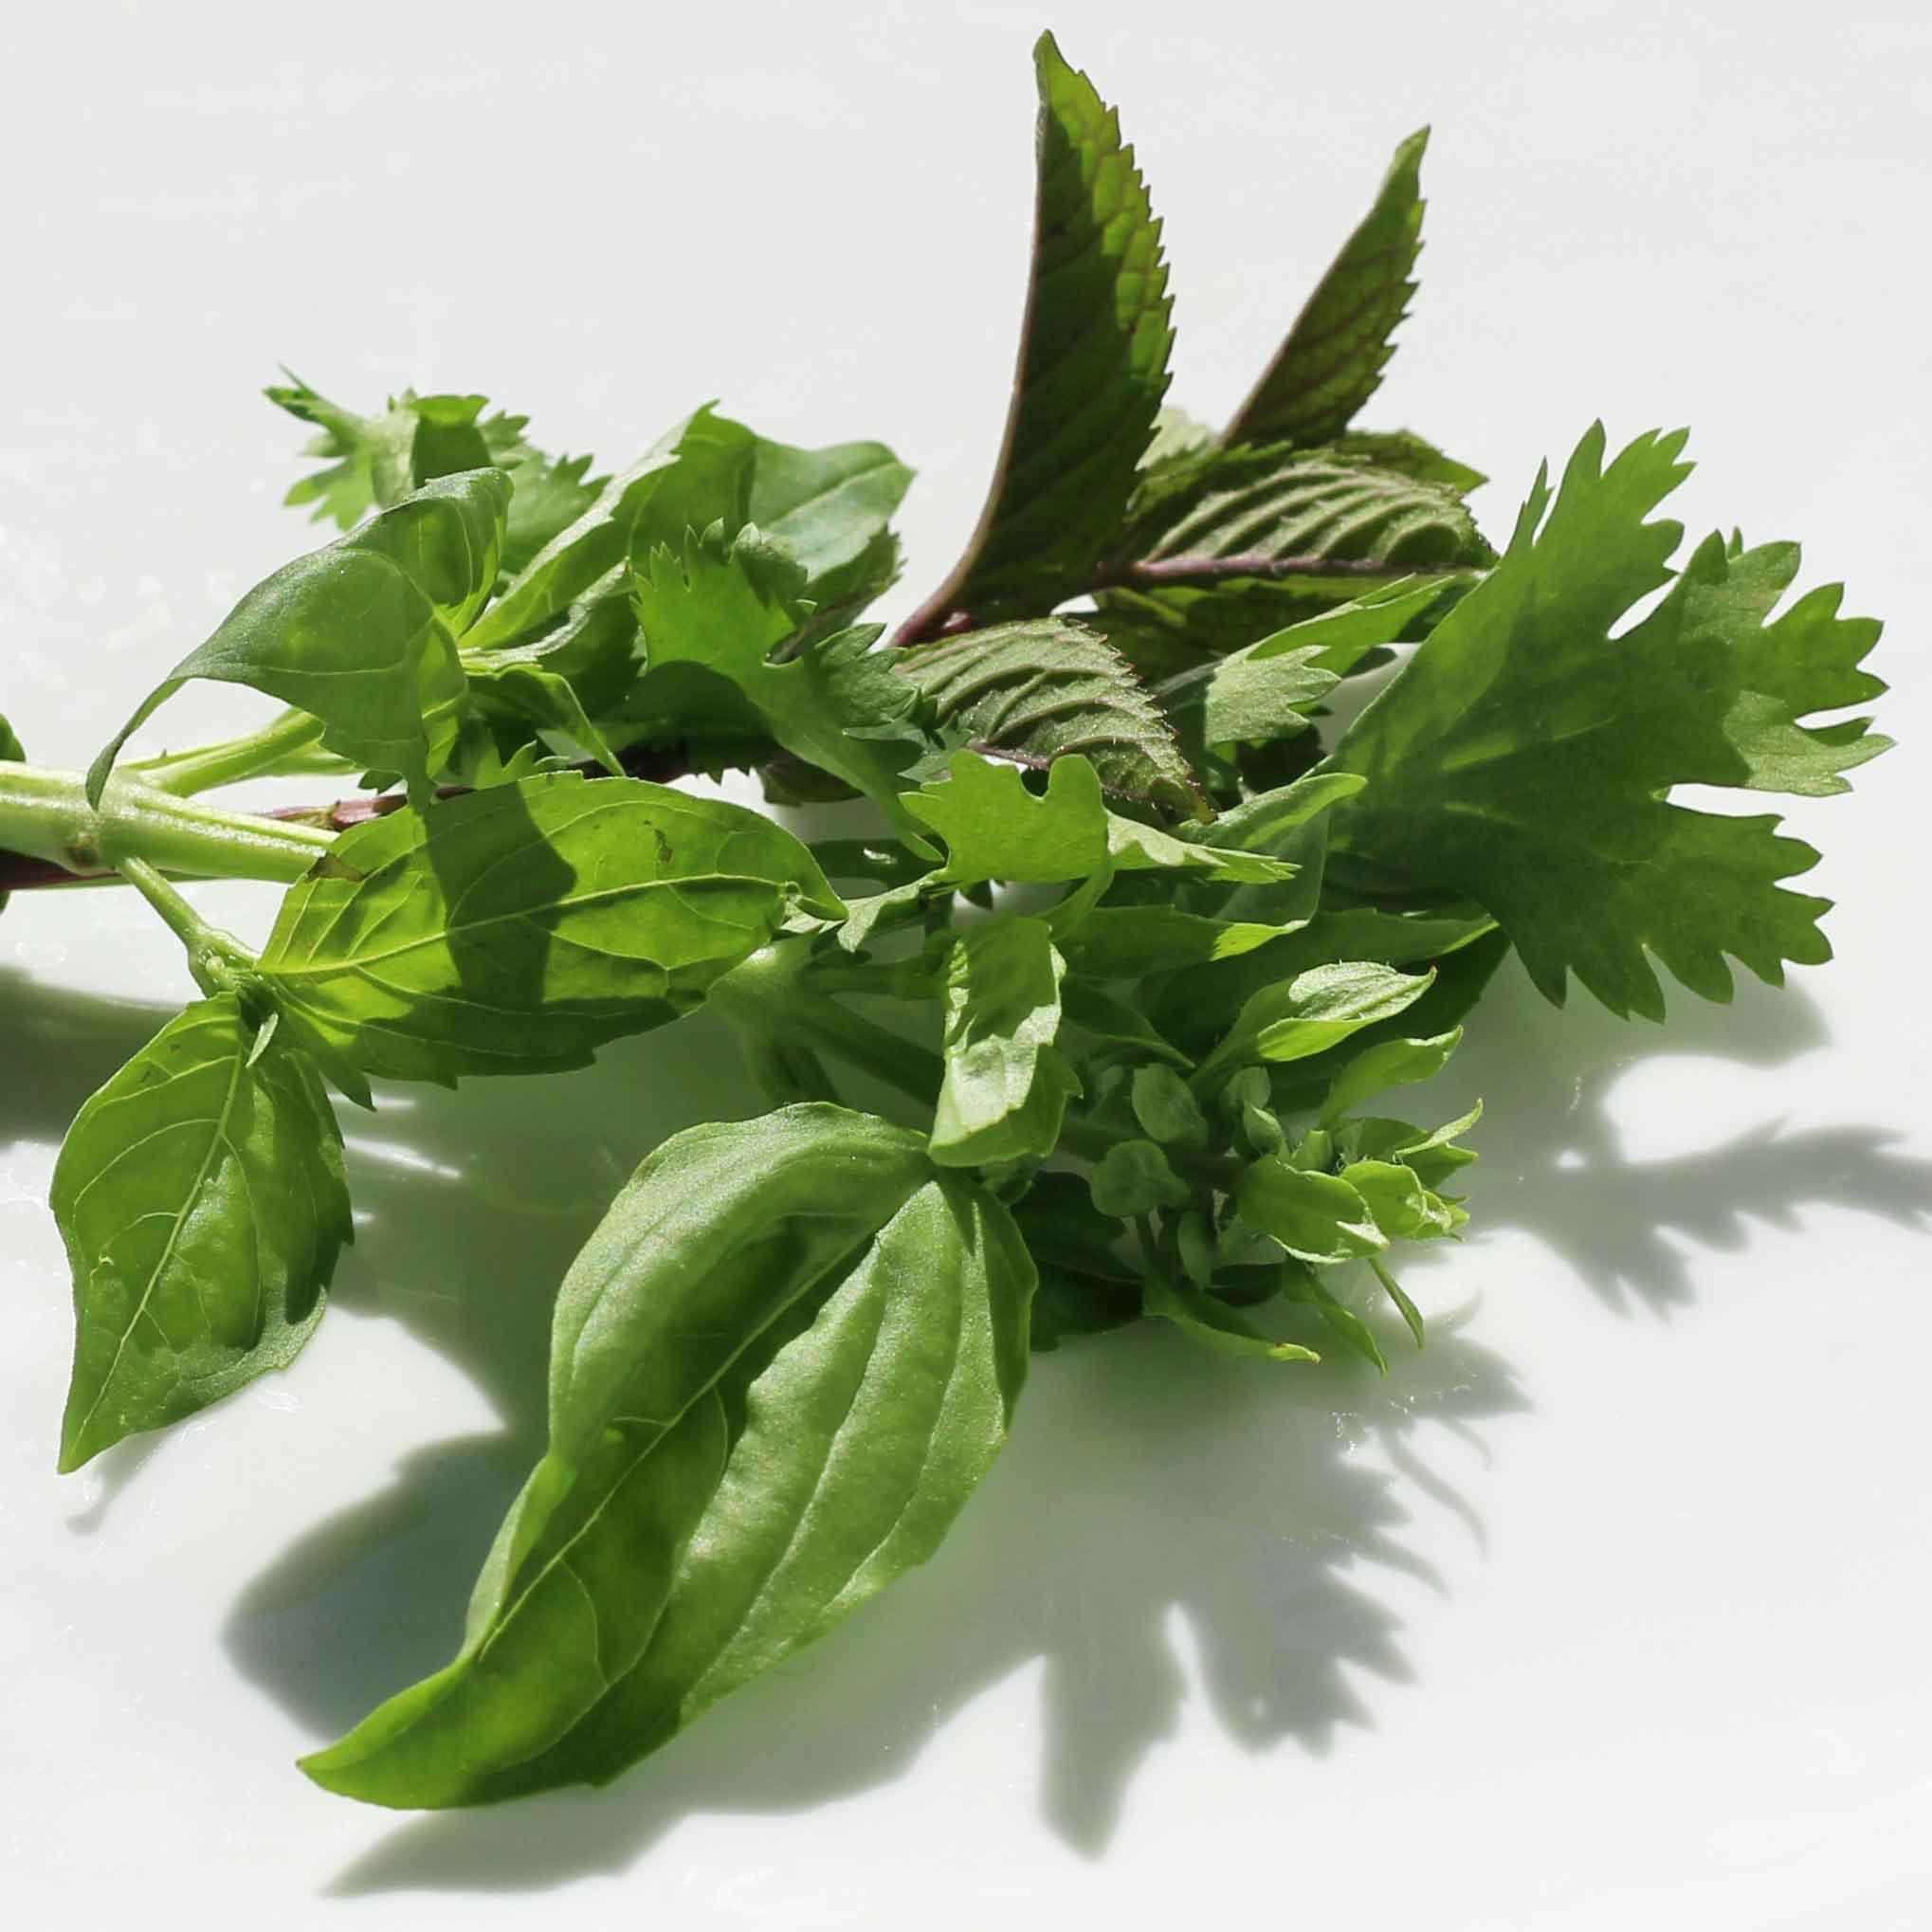 Garden fresh cilantro, basil and mint